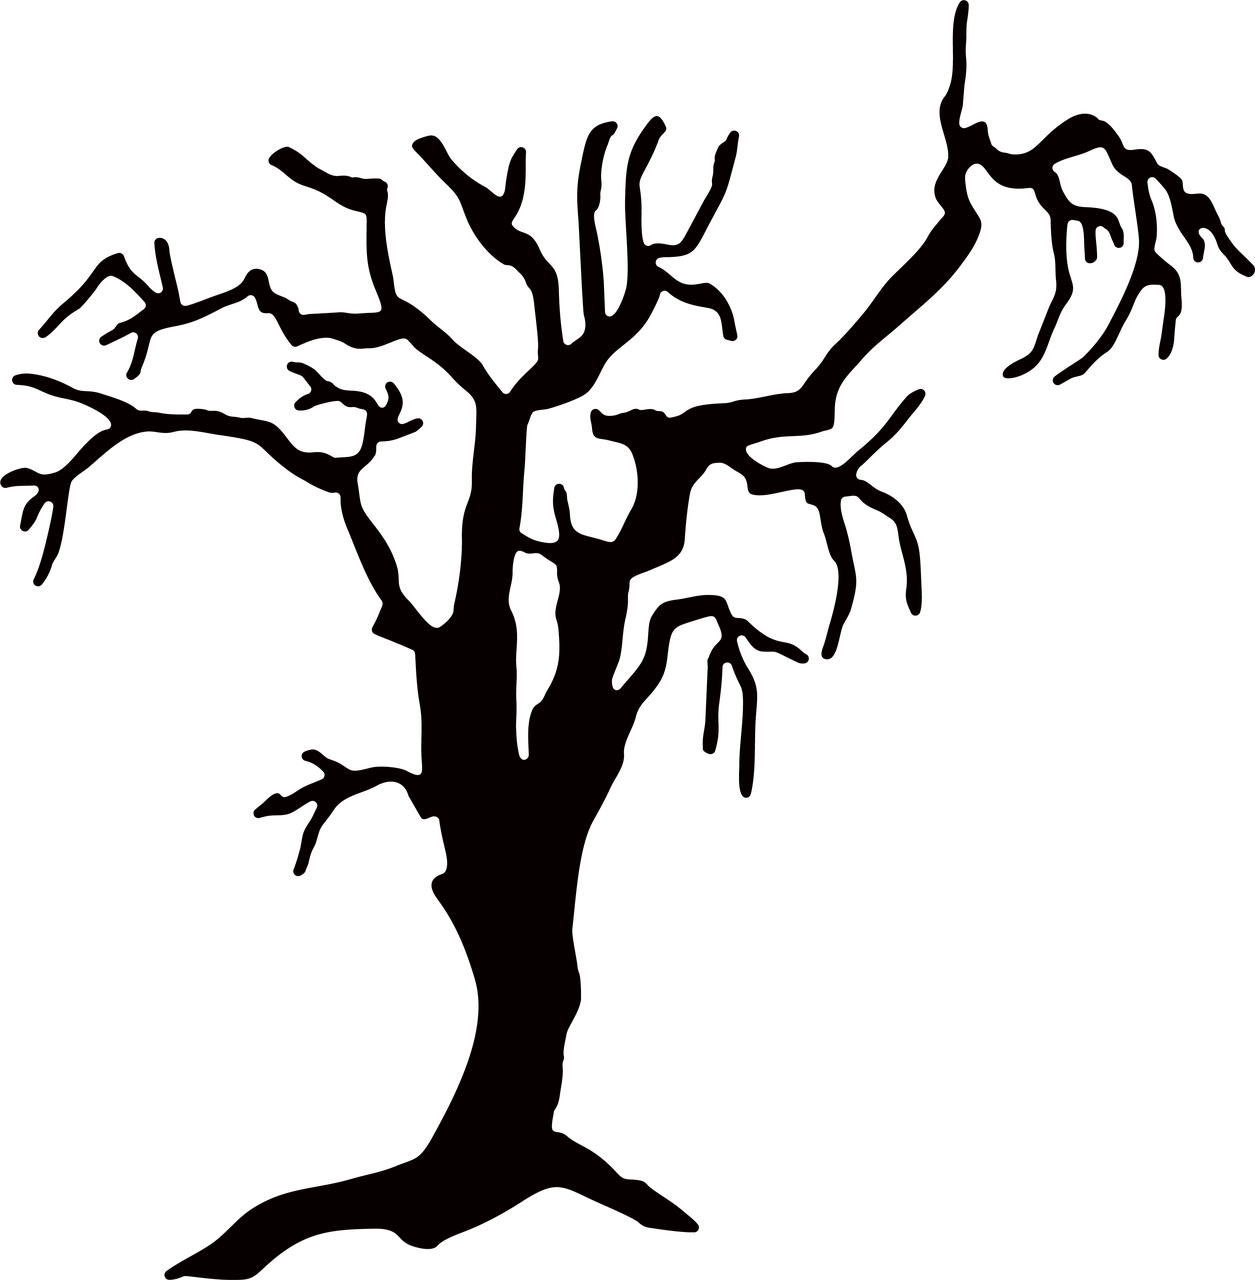 Haunted Tree SVG Cut File